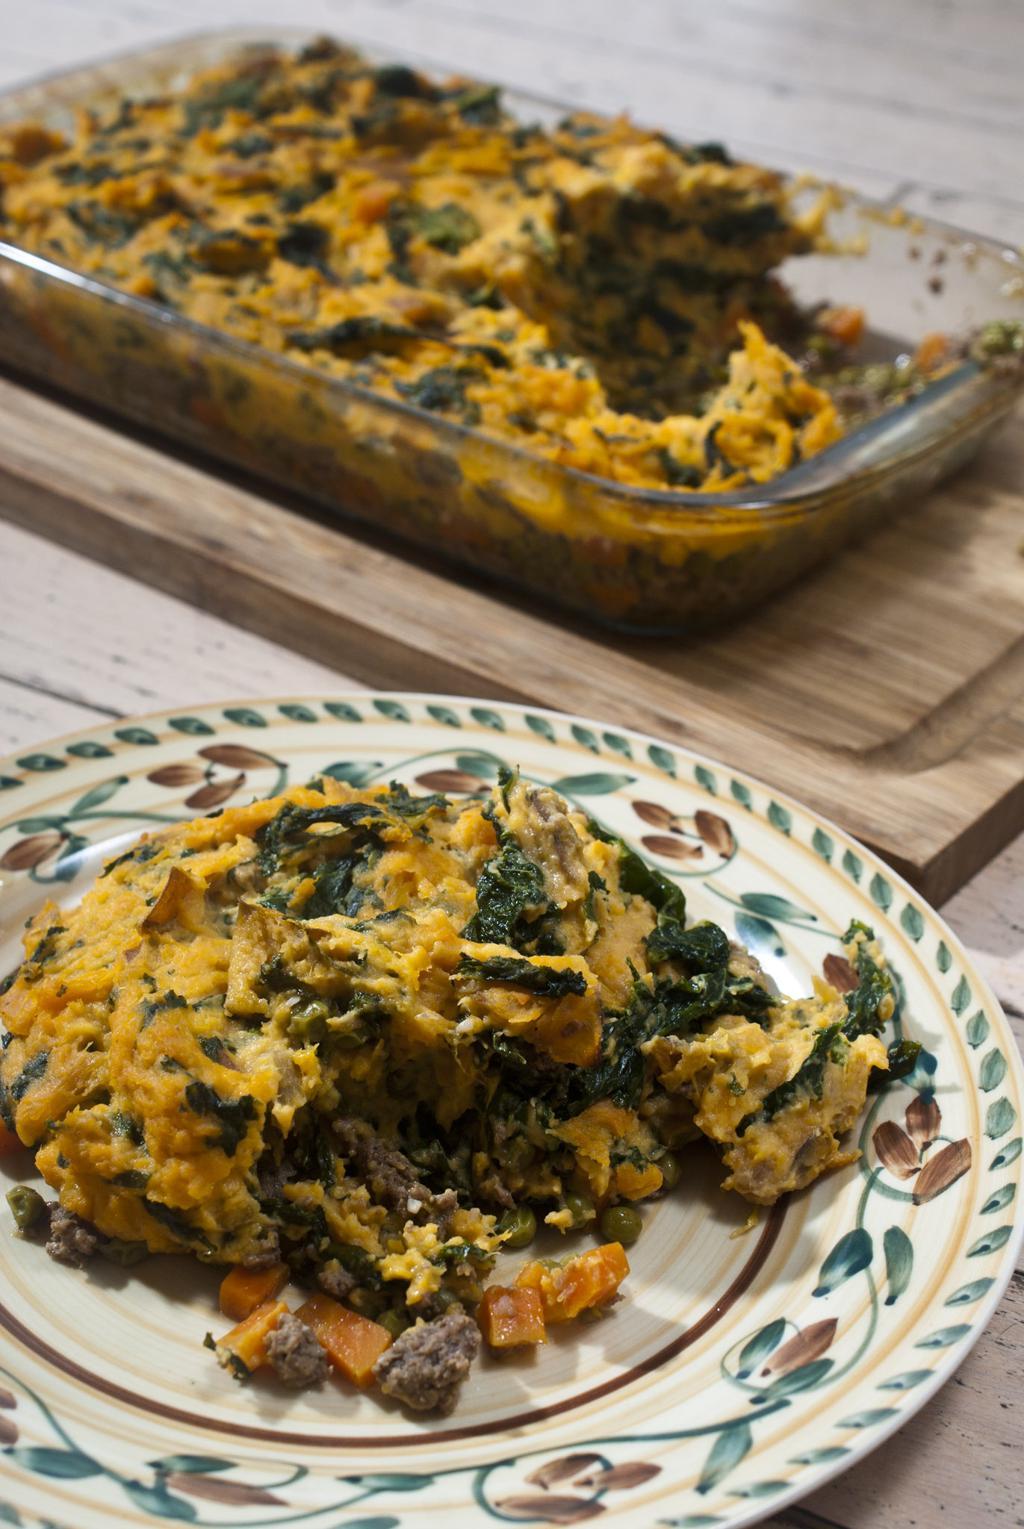 Sweet Potato and Sautéed Kale Shepherd's Pie